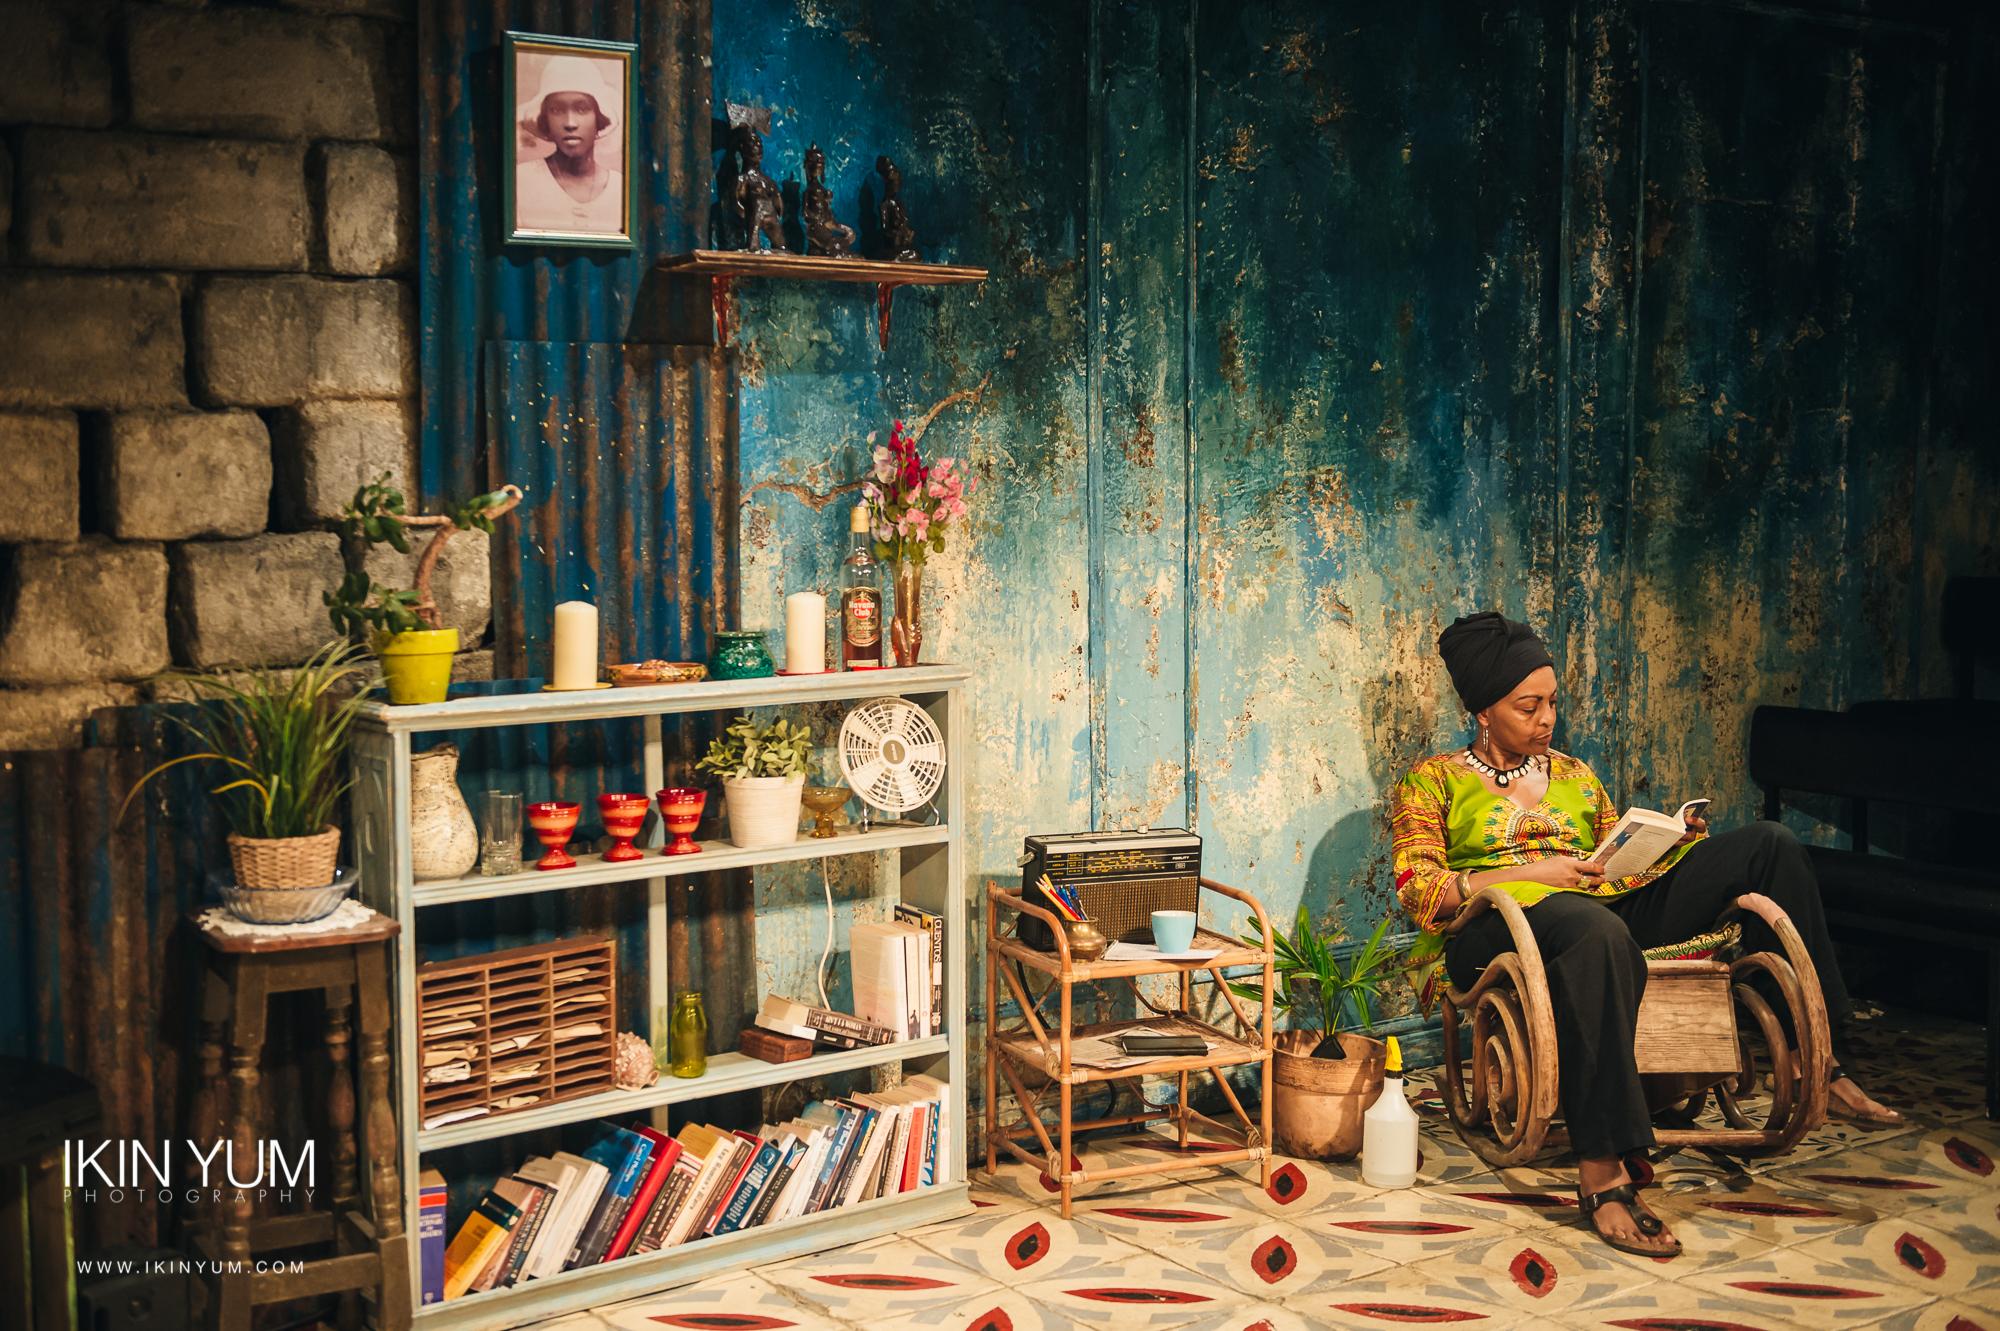 Assata Taught Me - Gate Theatre - Ikin Yum Photography-011.jpg